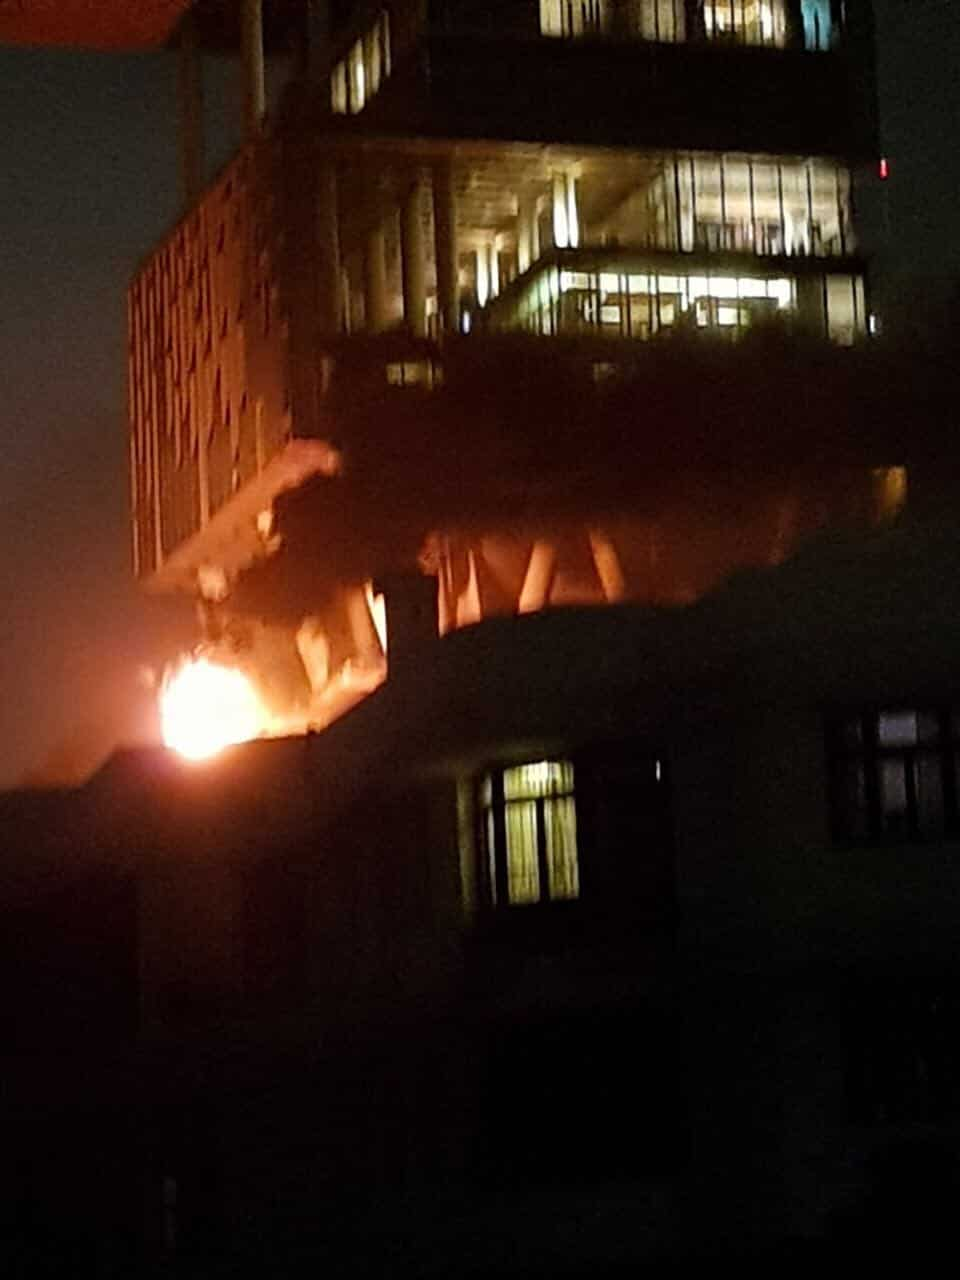 Mumbai: A fire broke out on a terrace in industrialist Mukesh Ambani's multi-storied south Mumbai residence 'Antilla' on July 10, 2017. (Photo: IANS)